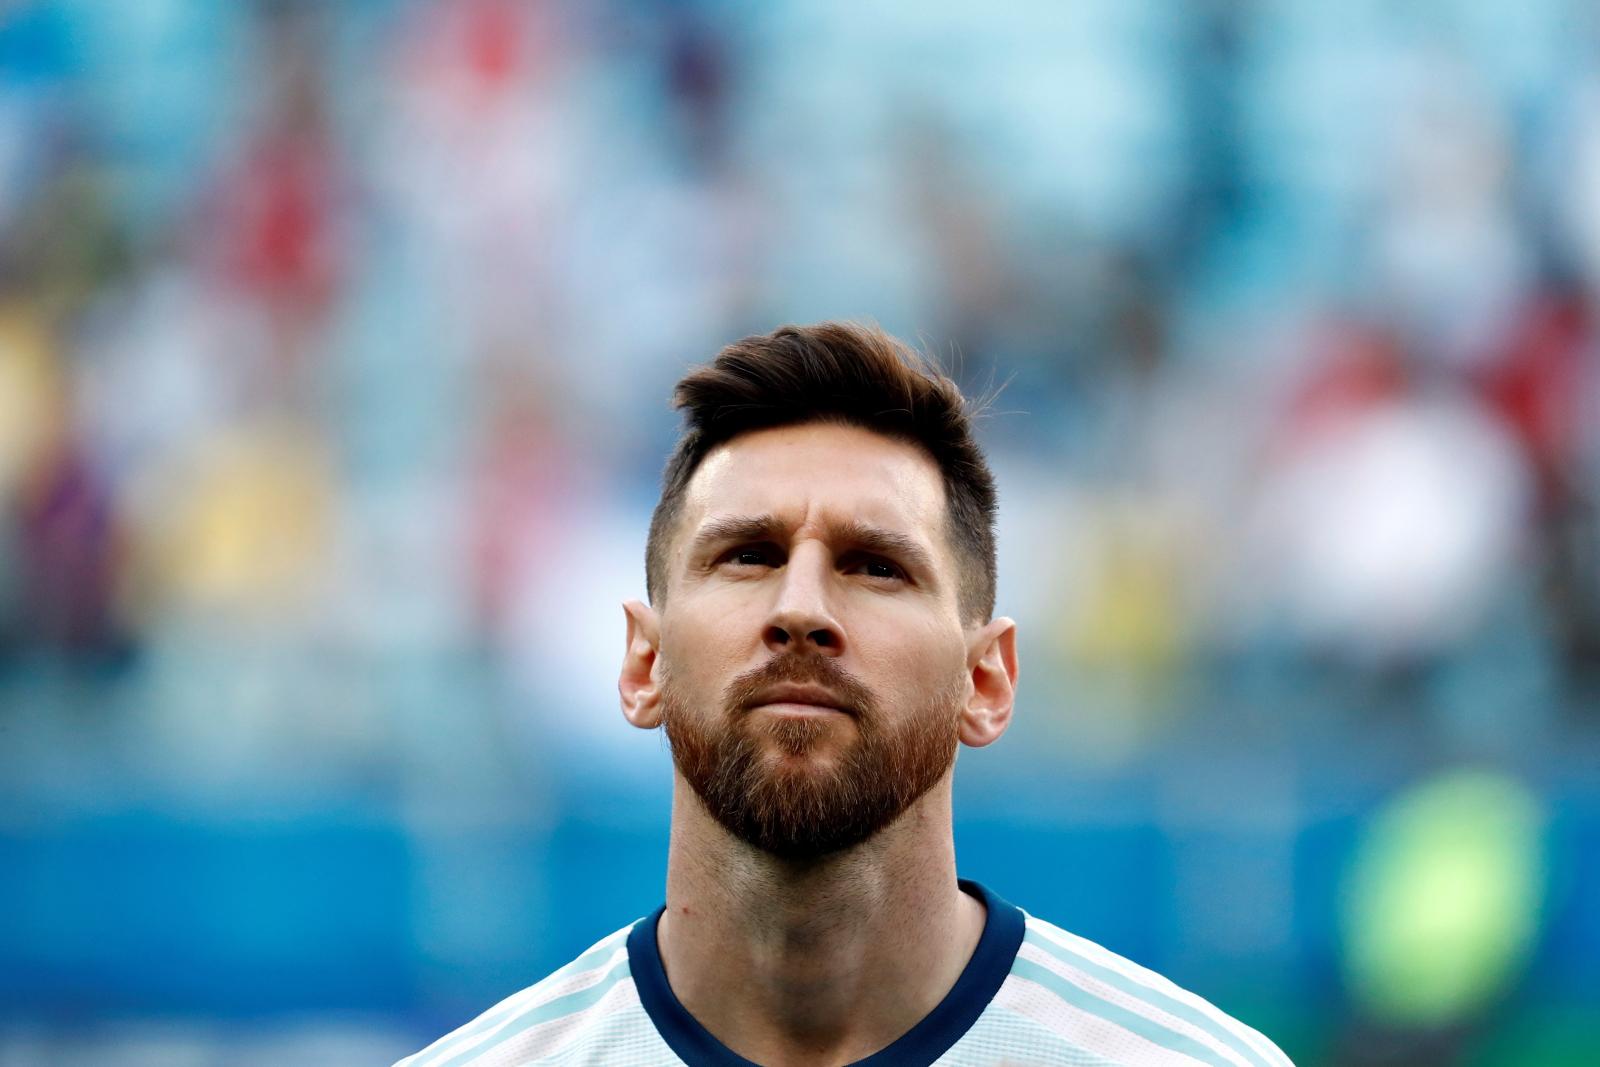 Lionel Messi podczas Copa America. Fot. PAP/EPA/Sebastiao Moreira